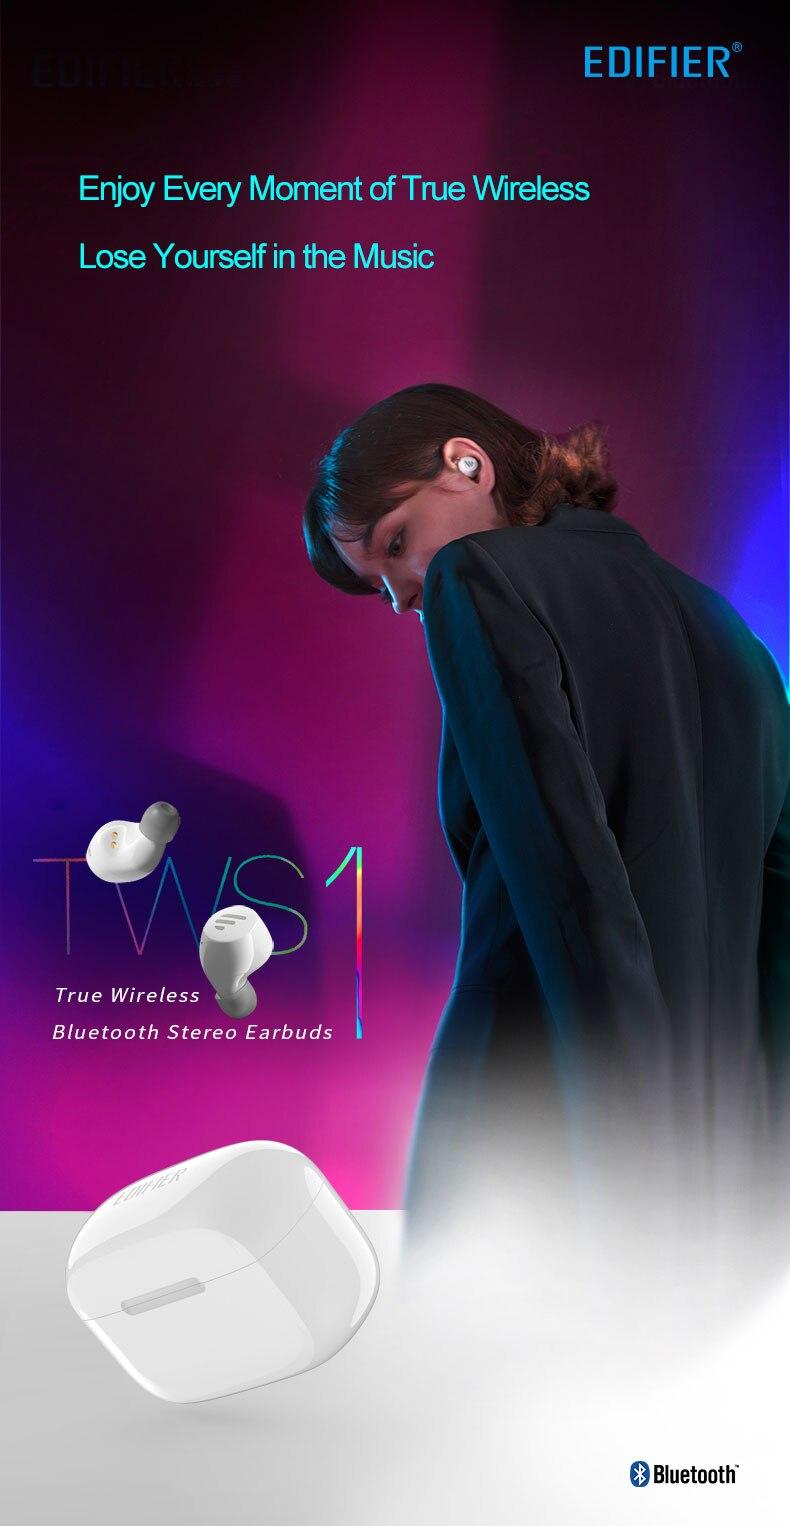 TWS1蓝牙耳机详情页-790-国际版-611_01